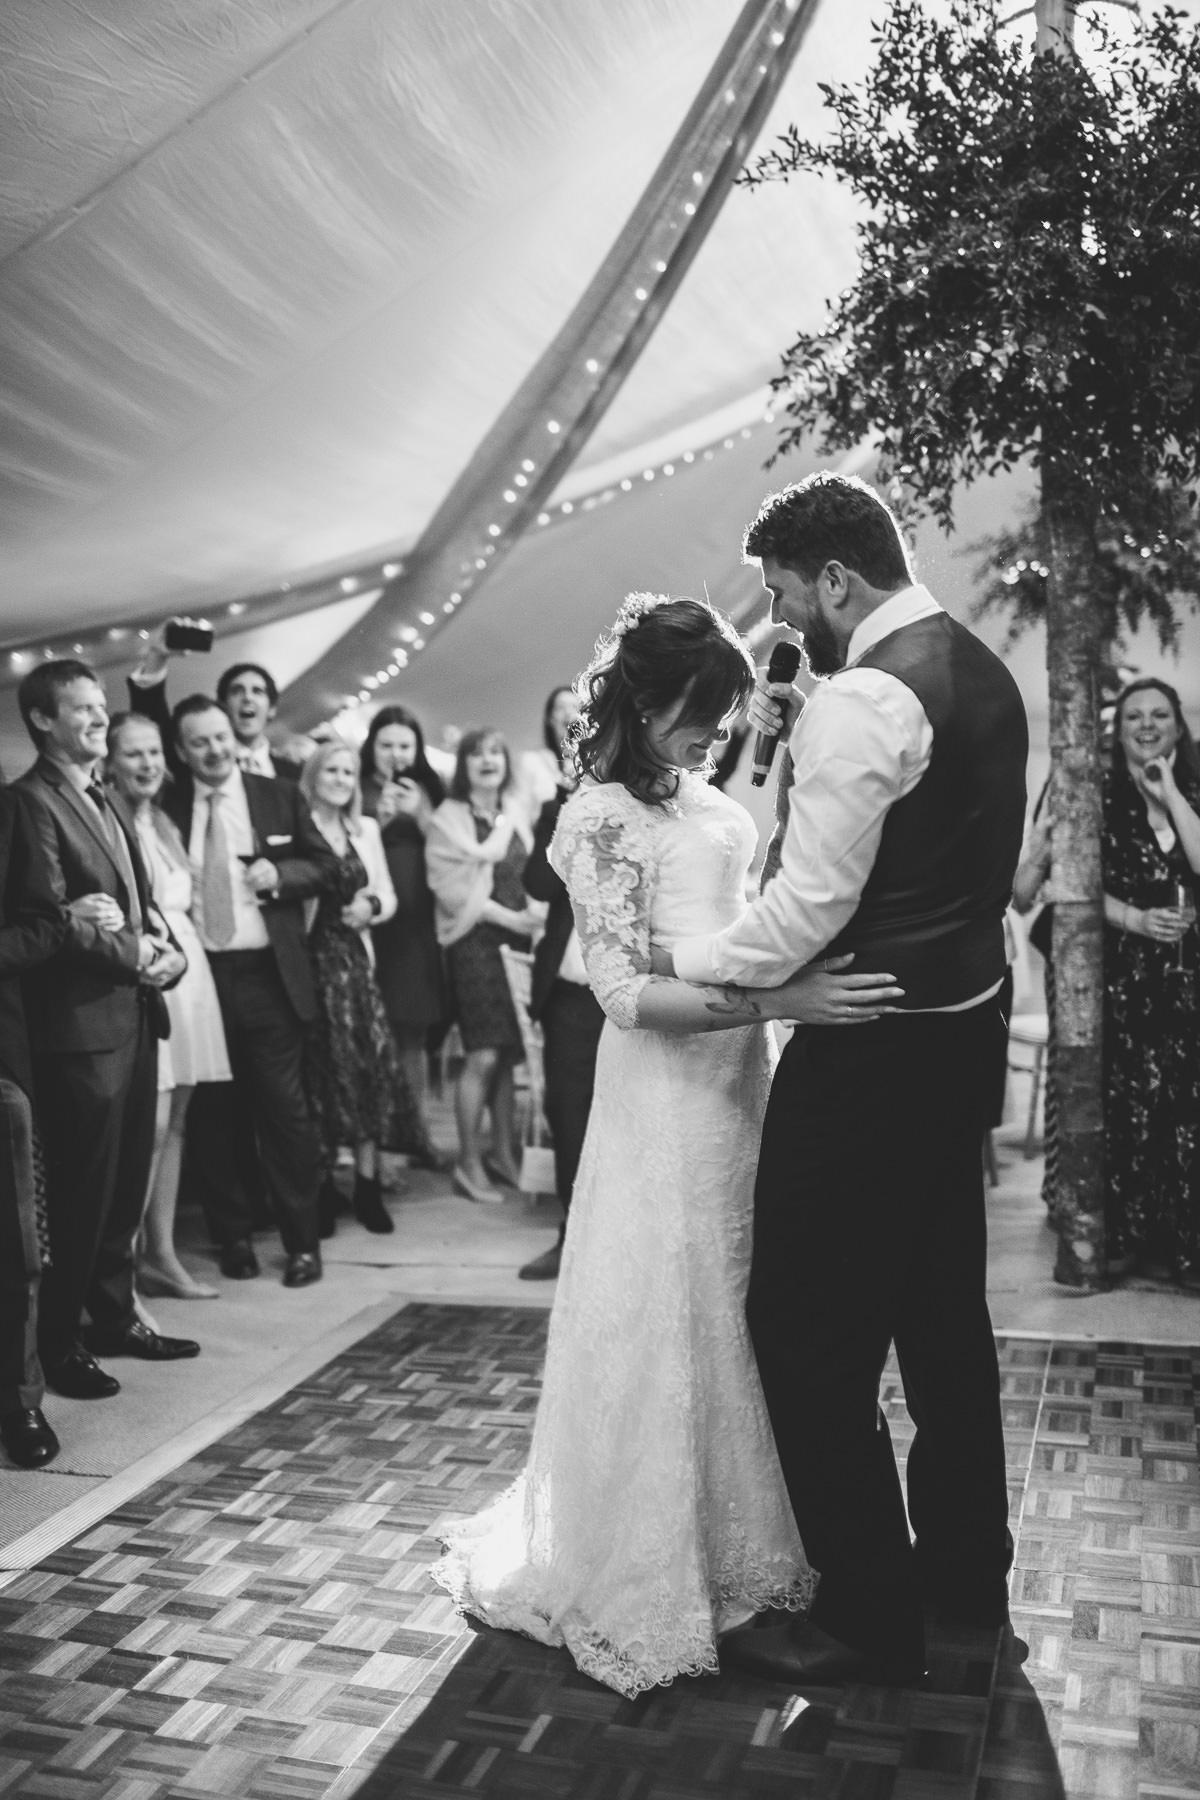 Pamber-Place-wedding-photography-basingstoke-hampshire-234